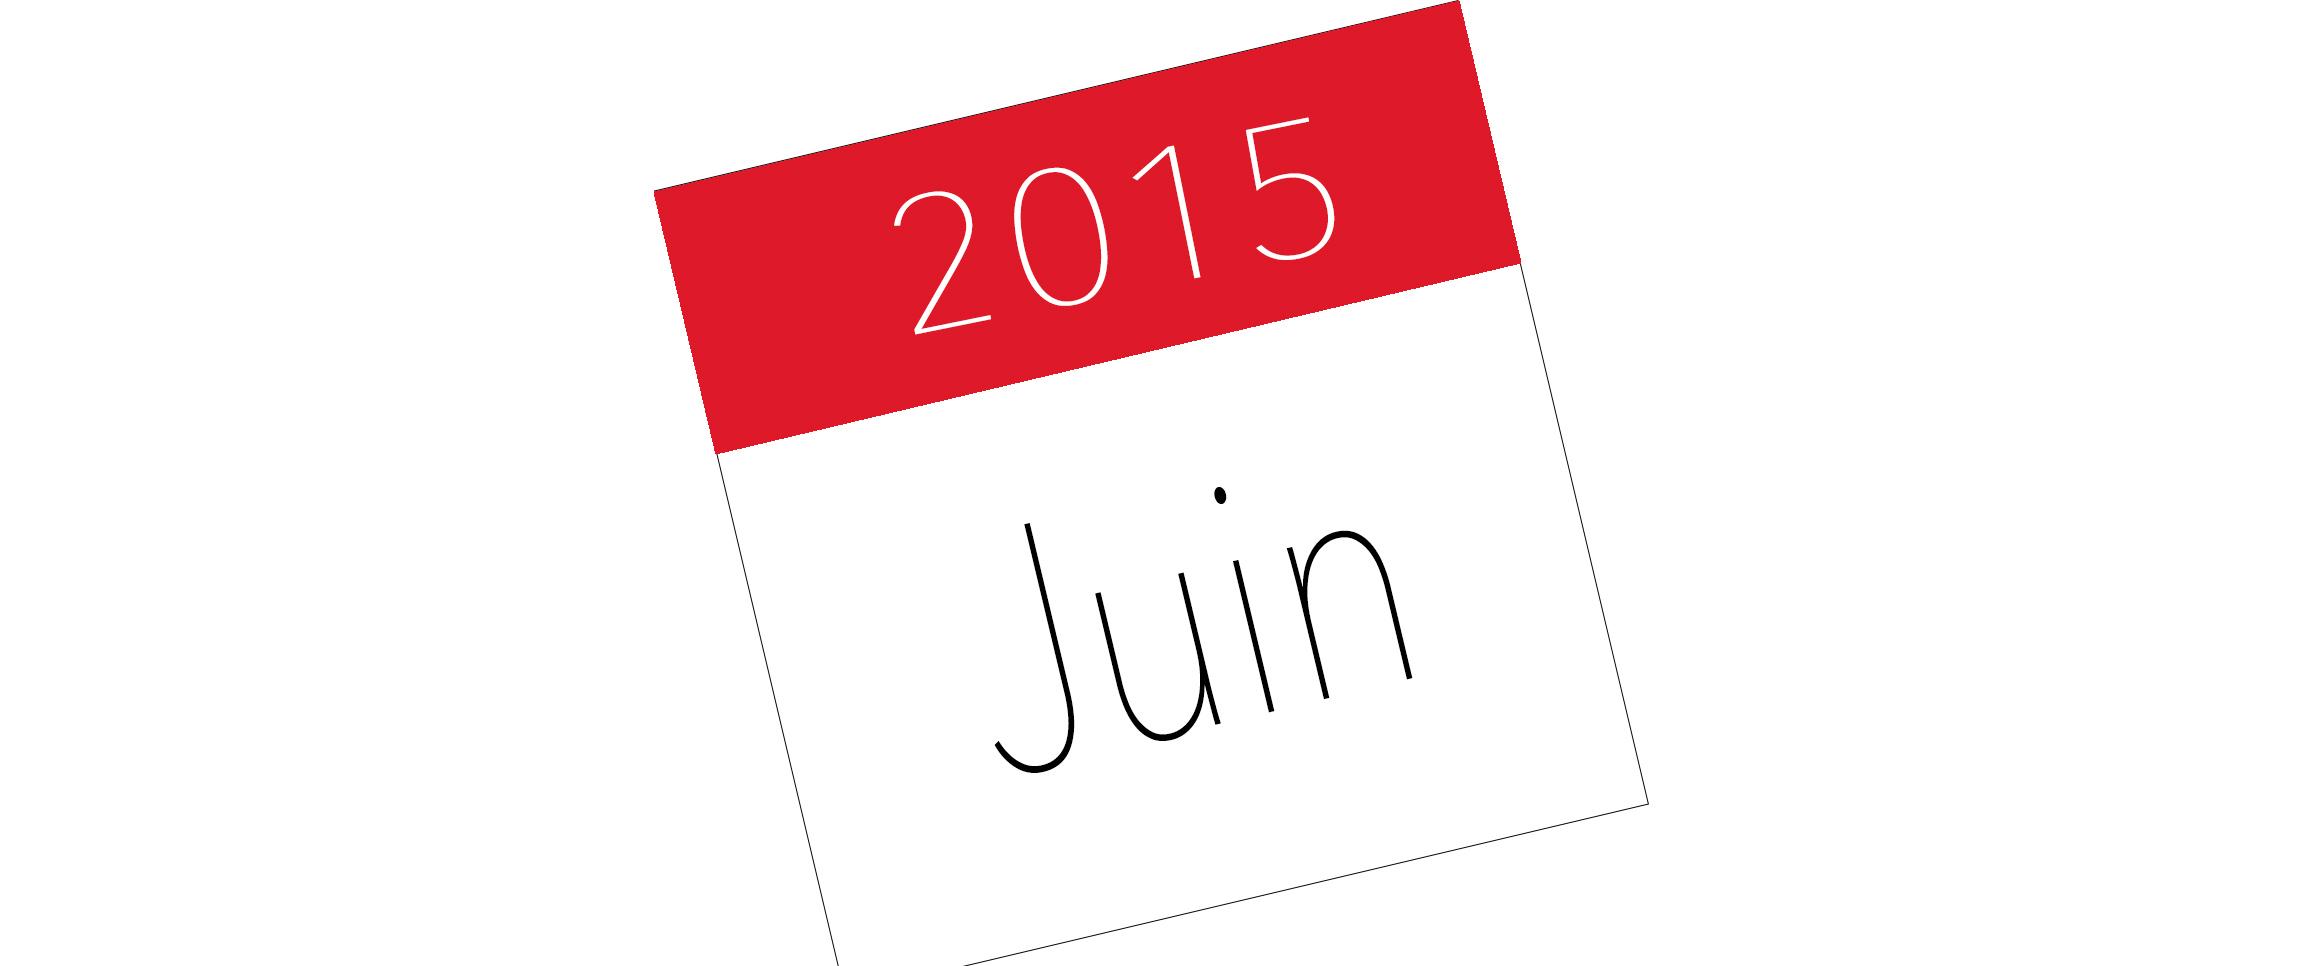 calendrier-site-juin-2015.jpg